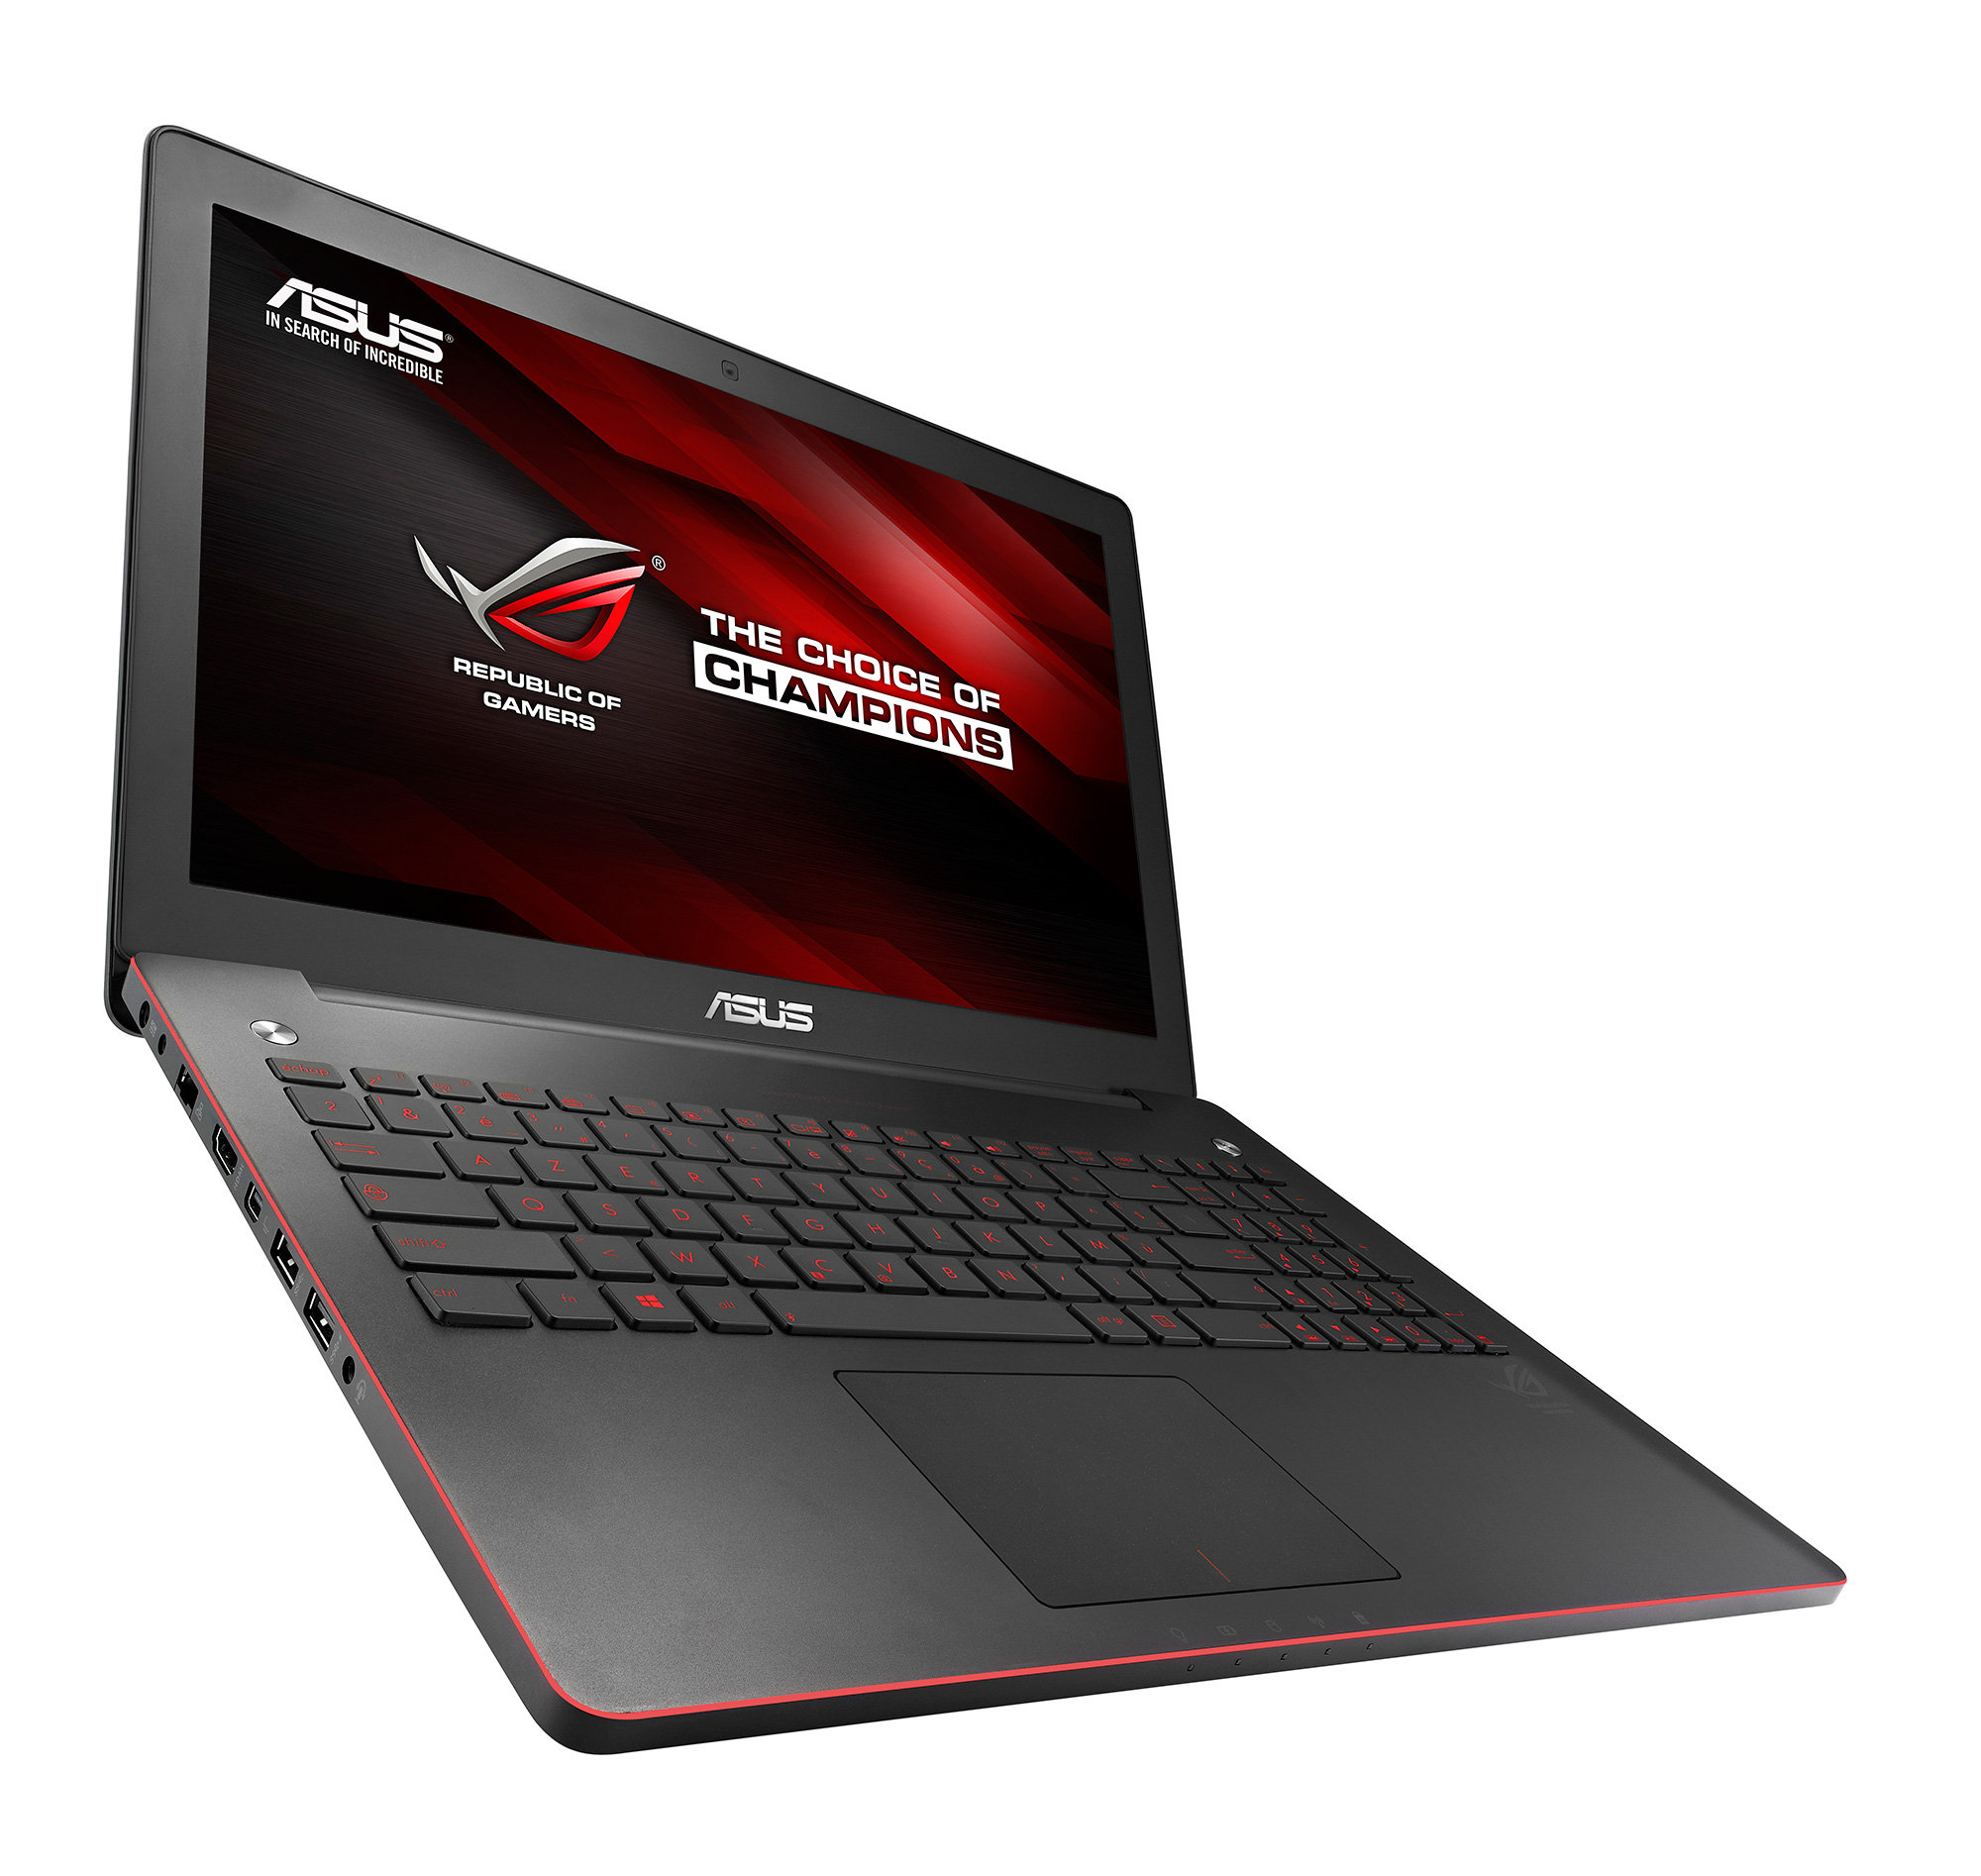 Asus се цели високо на пазара за гейминг лаптопи